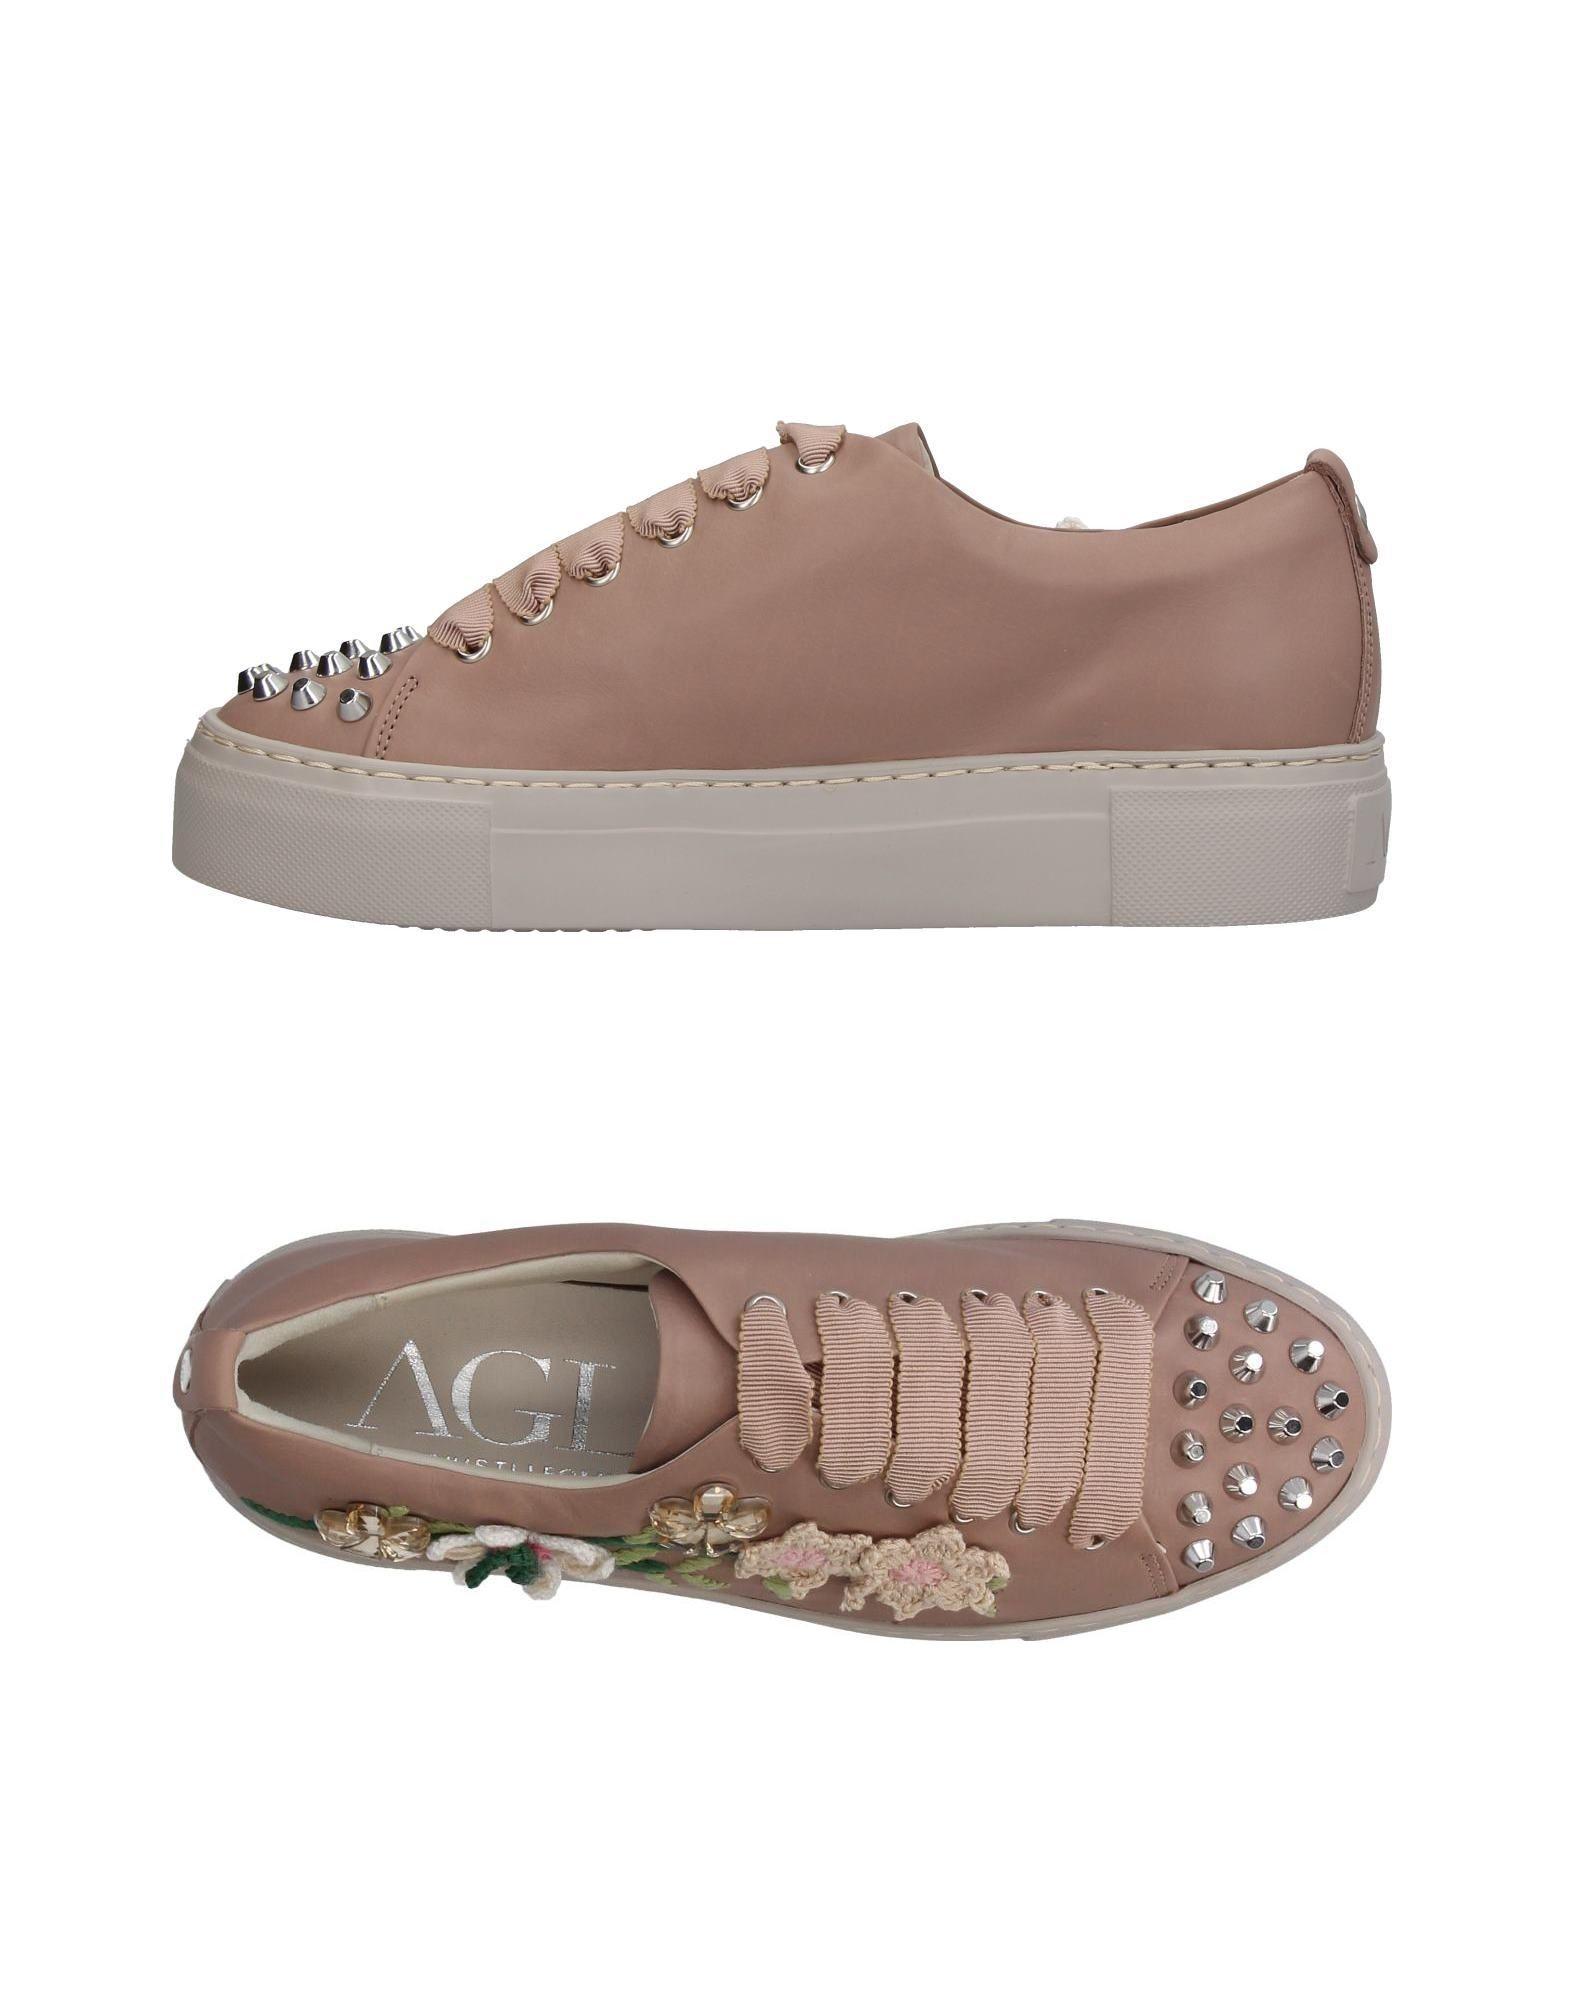 Stilvolle billige Schuhe Agl Attilio Giusti Leombruni Sneakers Damen  11413718FH